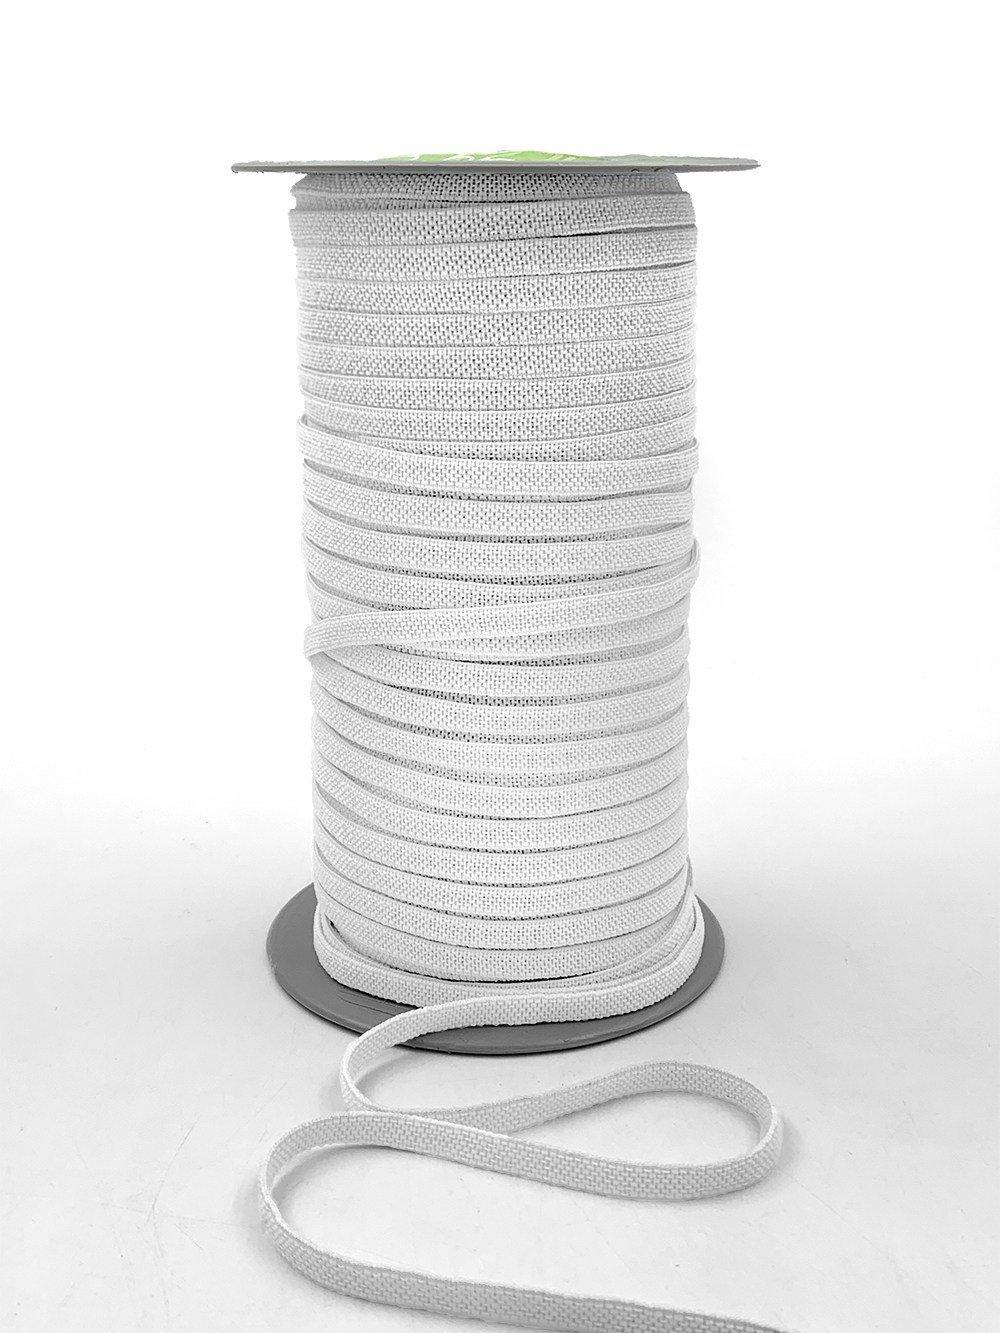 Elastic - 1/4 (6mm) Flat White